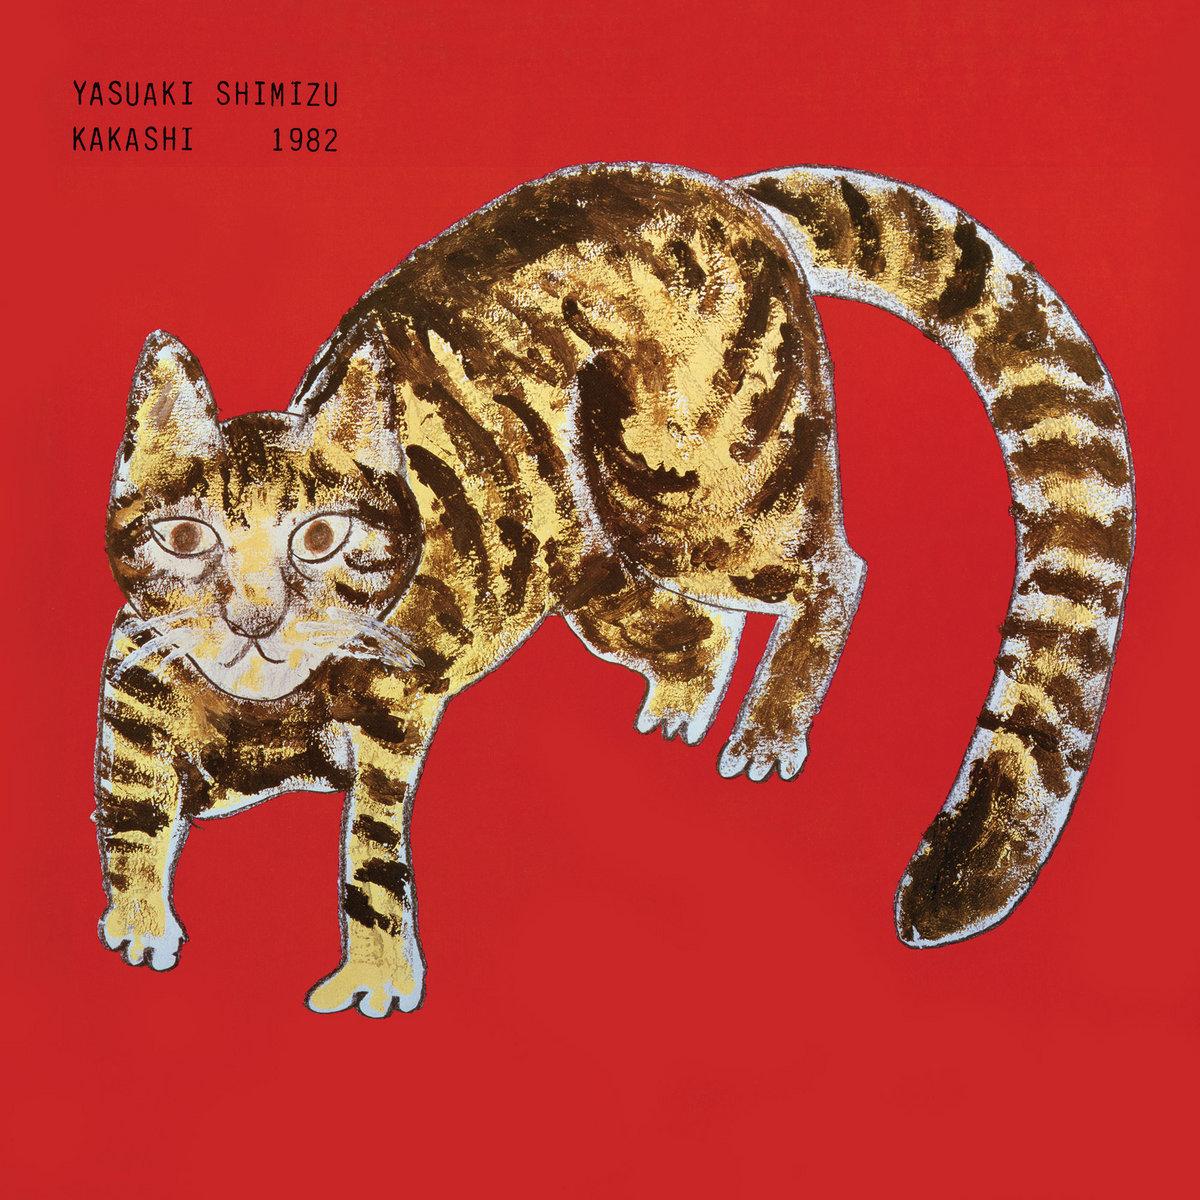 Kakashi | Yasuaki Shimizu | WRWTFWW Records